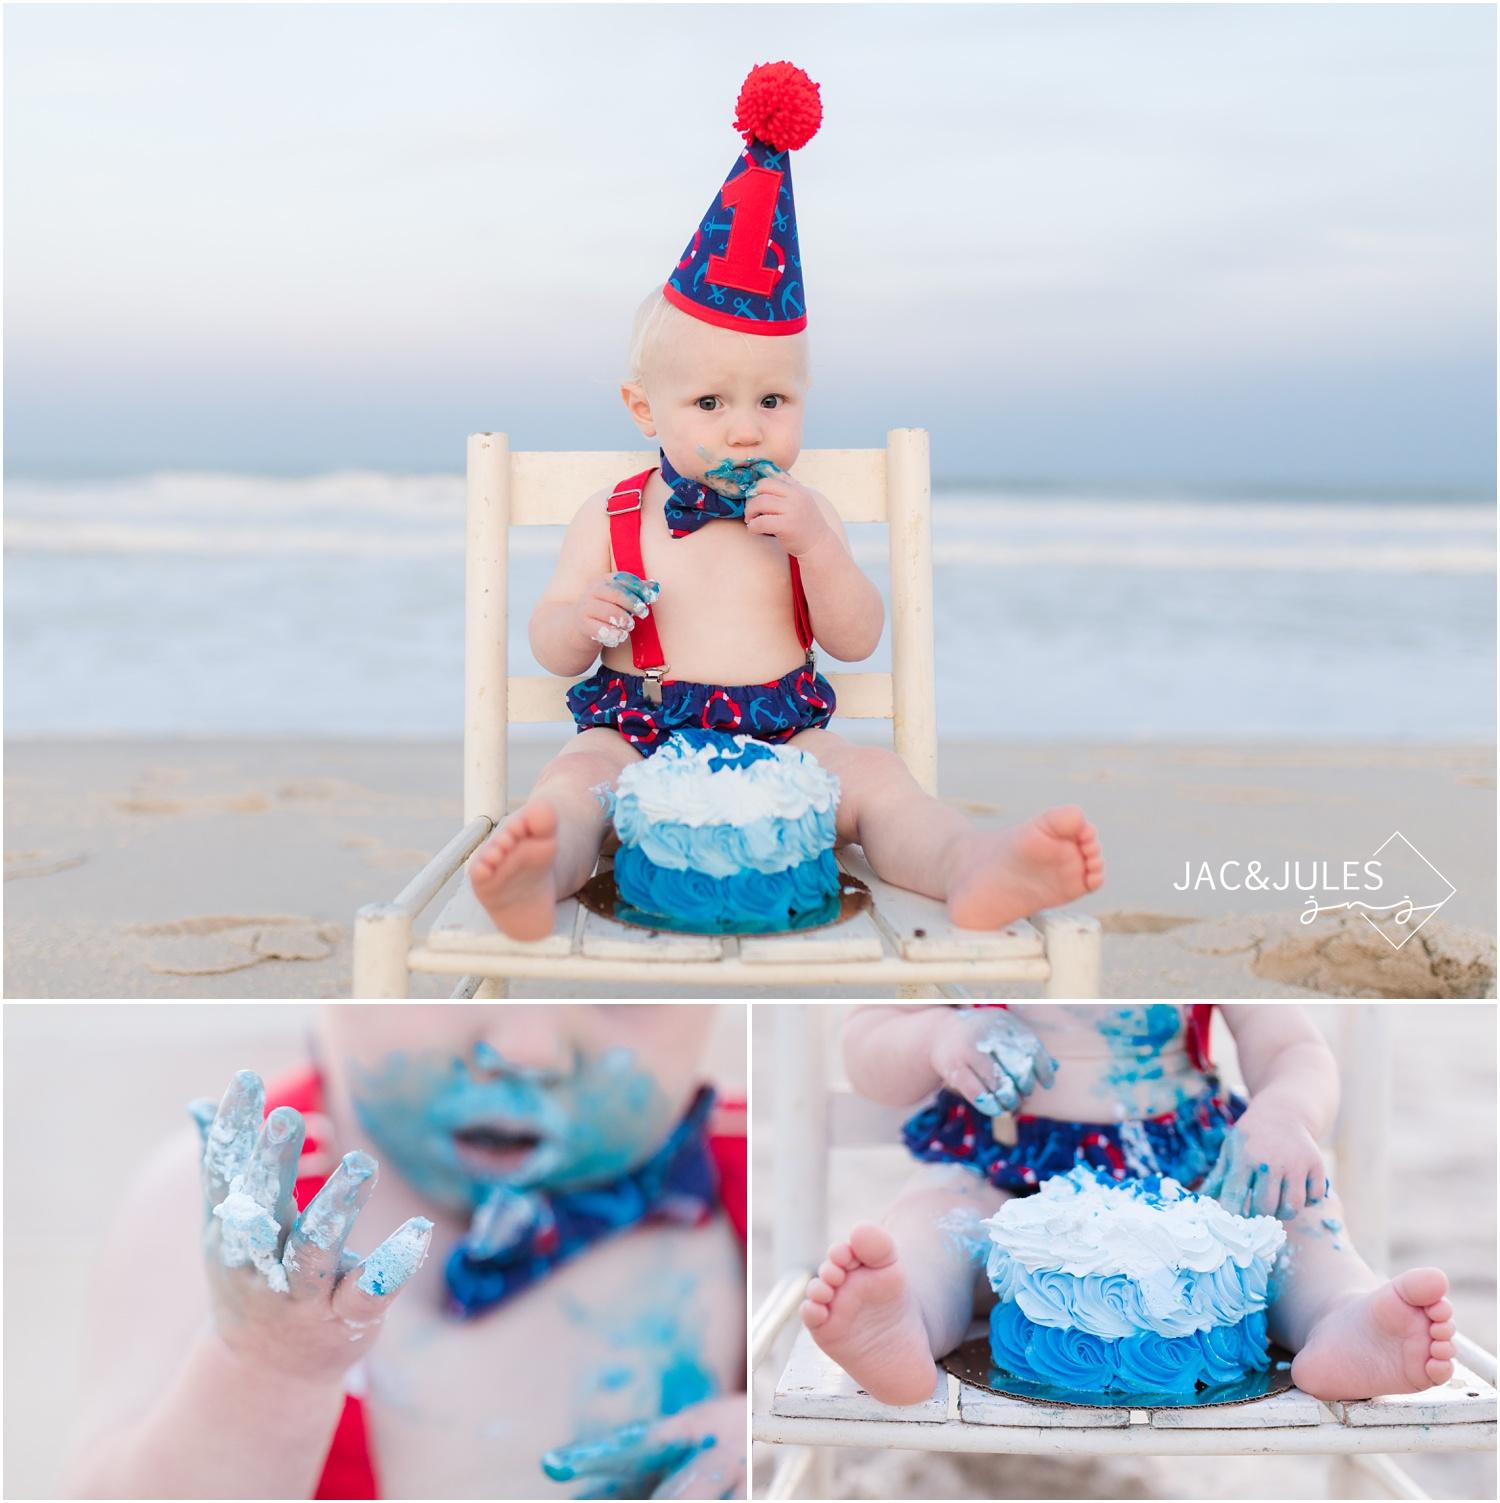 First birthday cake smash photos at Island beach State Park in Seaside Park, nj.